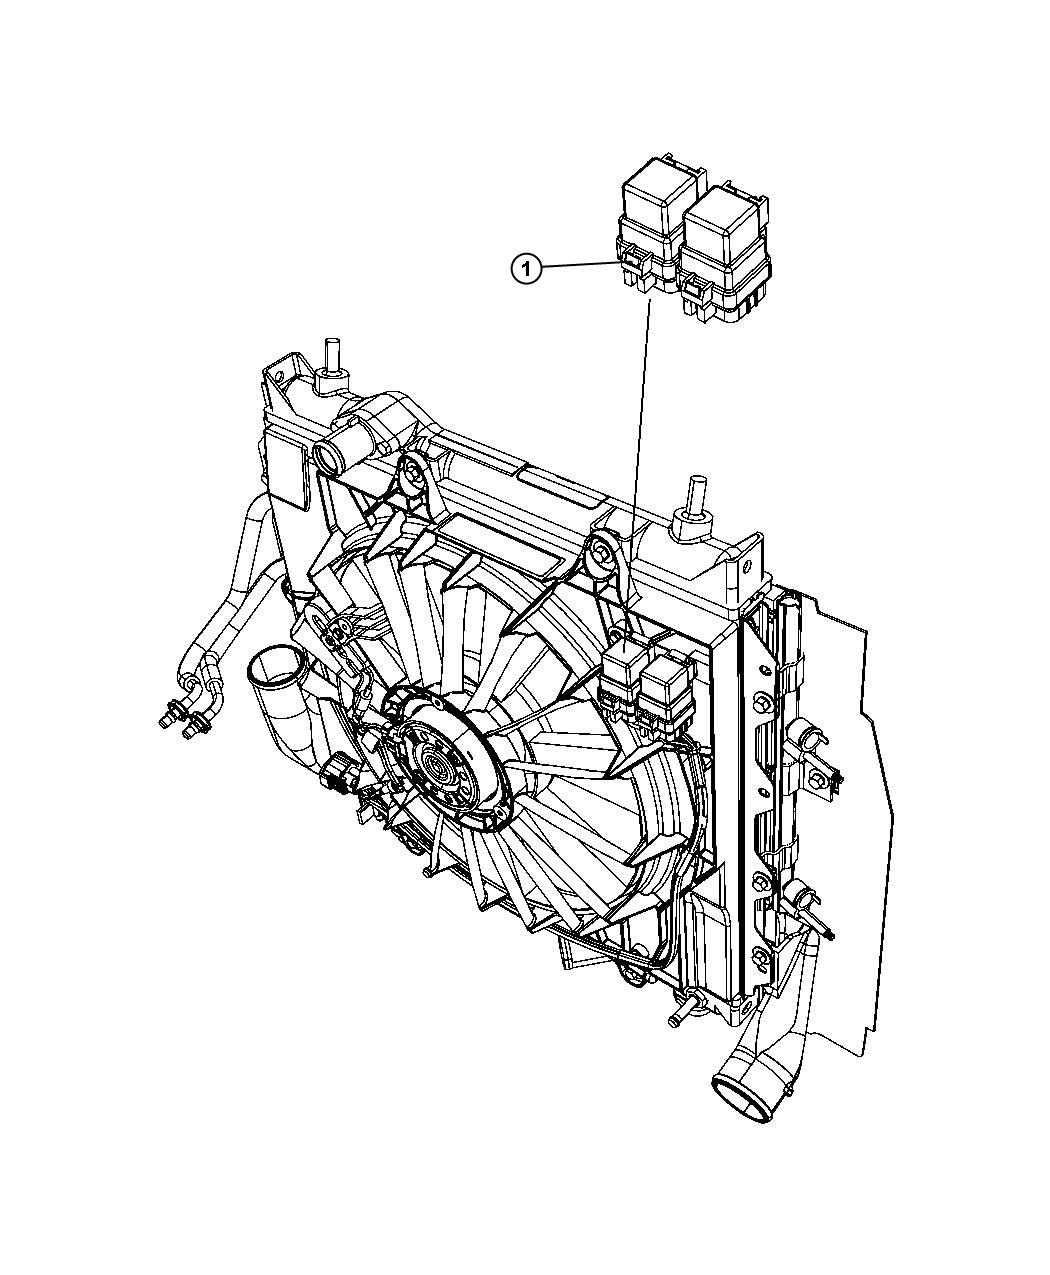 pt cruiser fan relay wire diagram